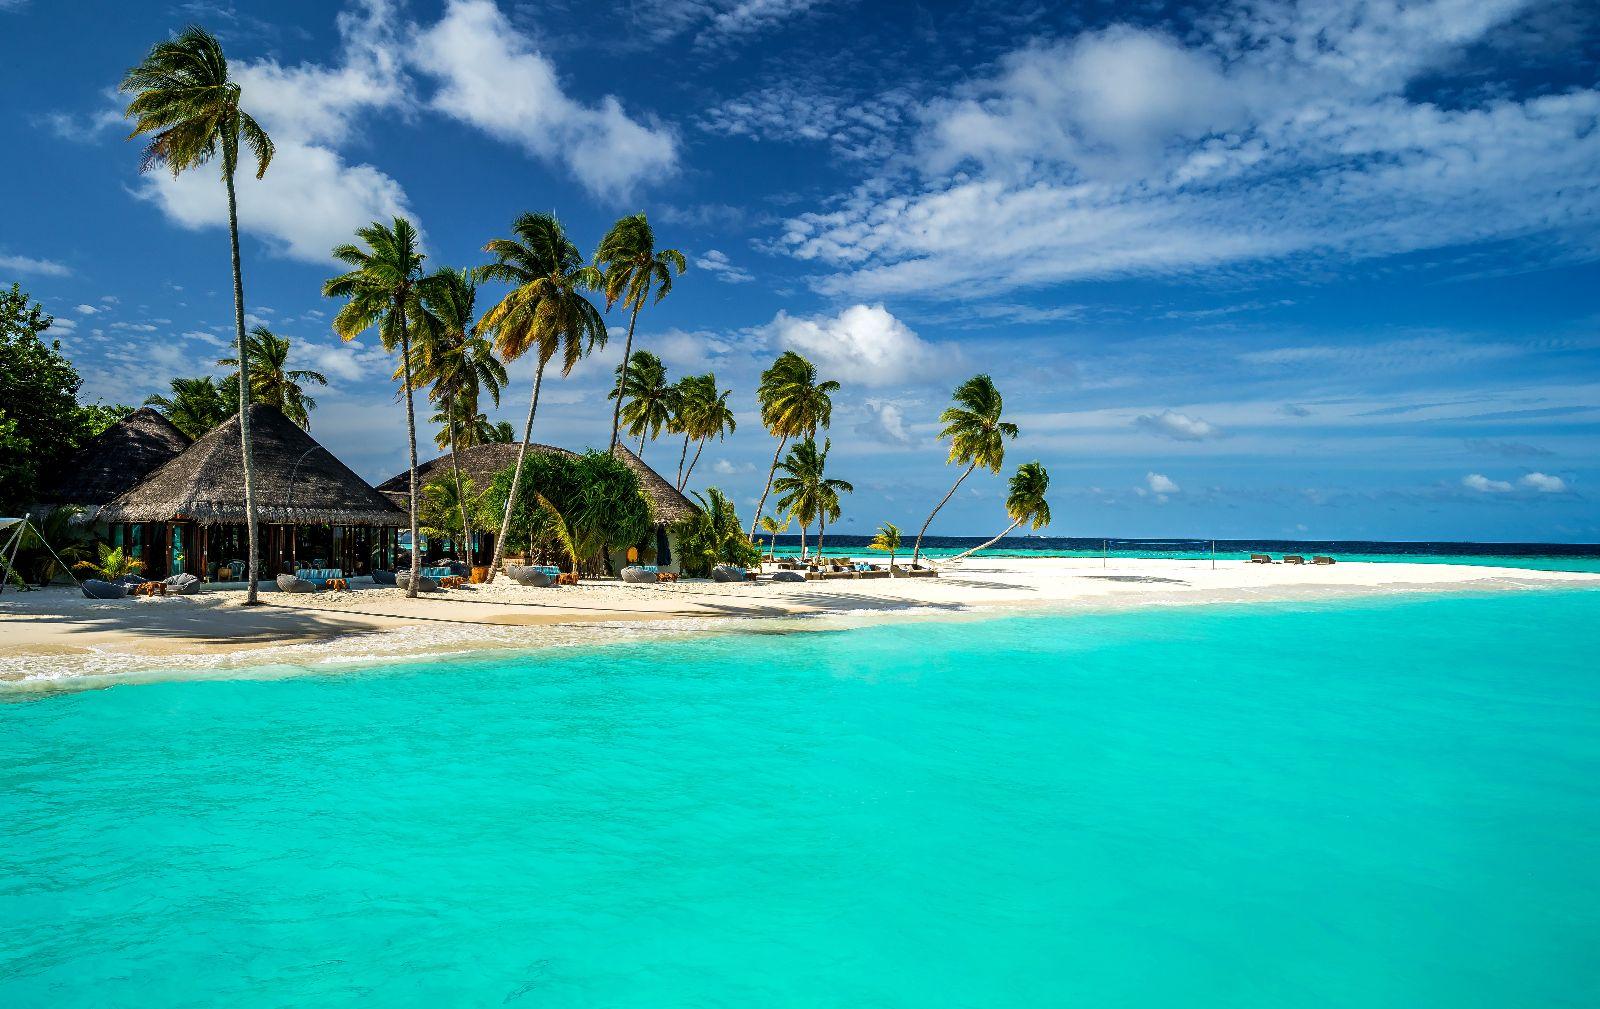 Maldives - путешествия и отдых